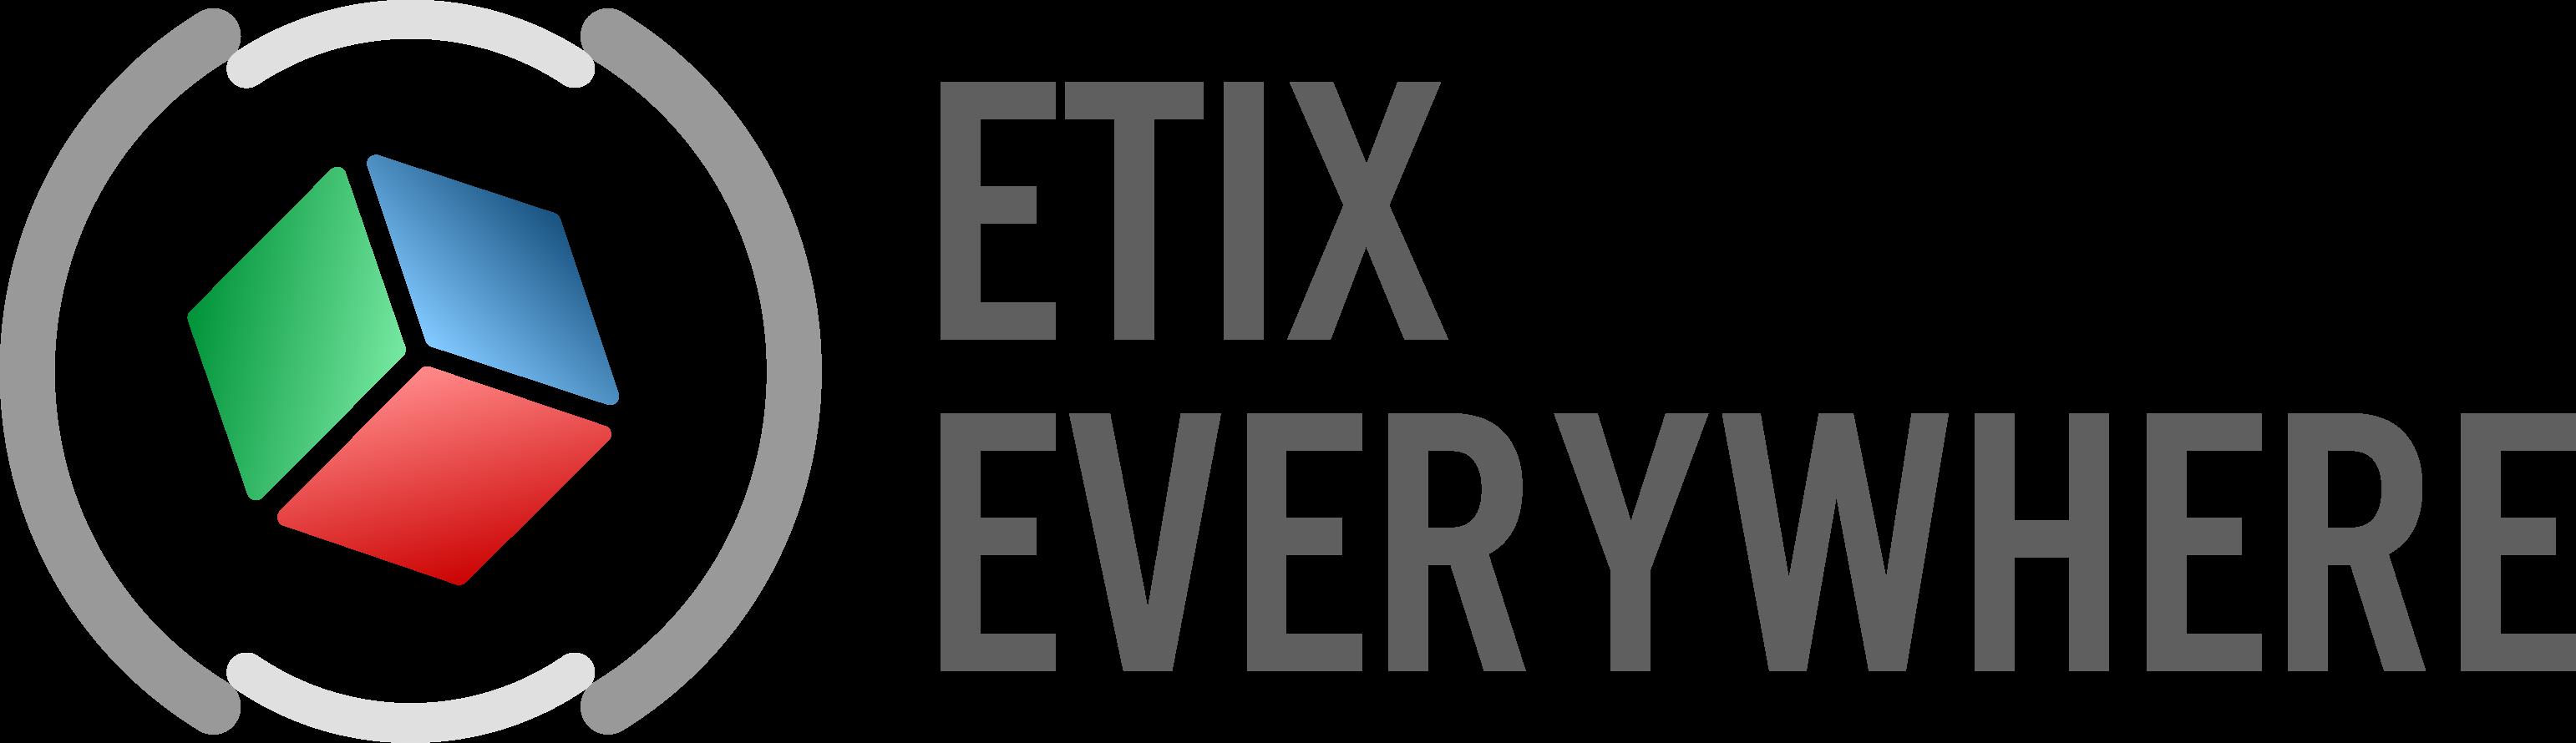 Etix_Everywhere_Logo